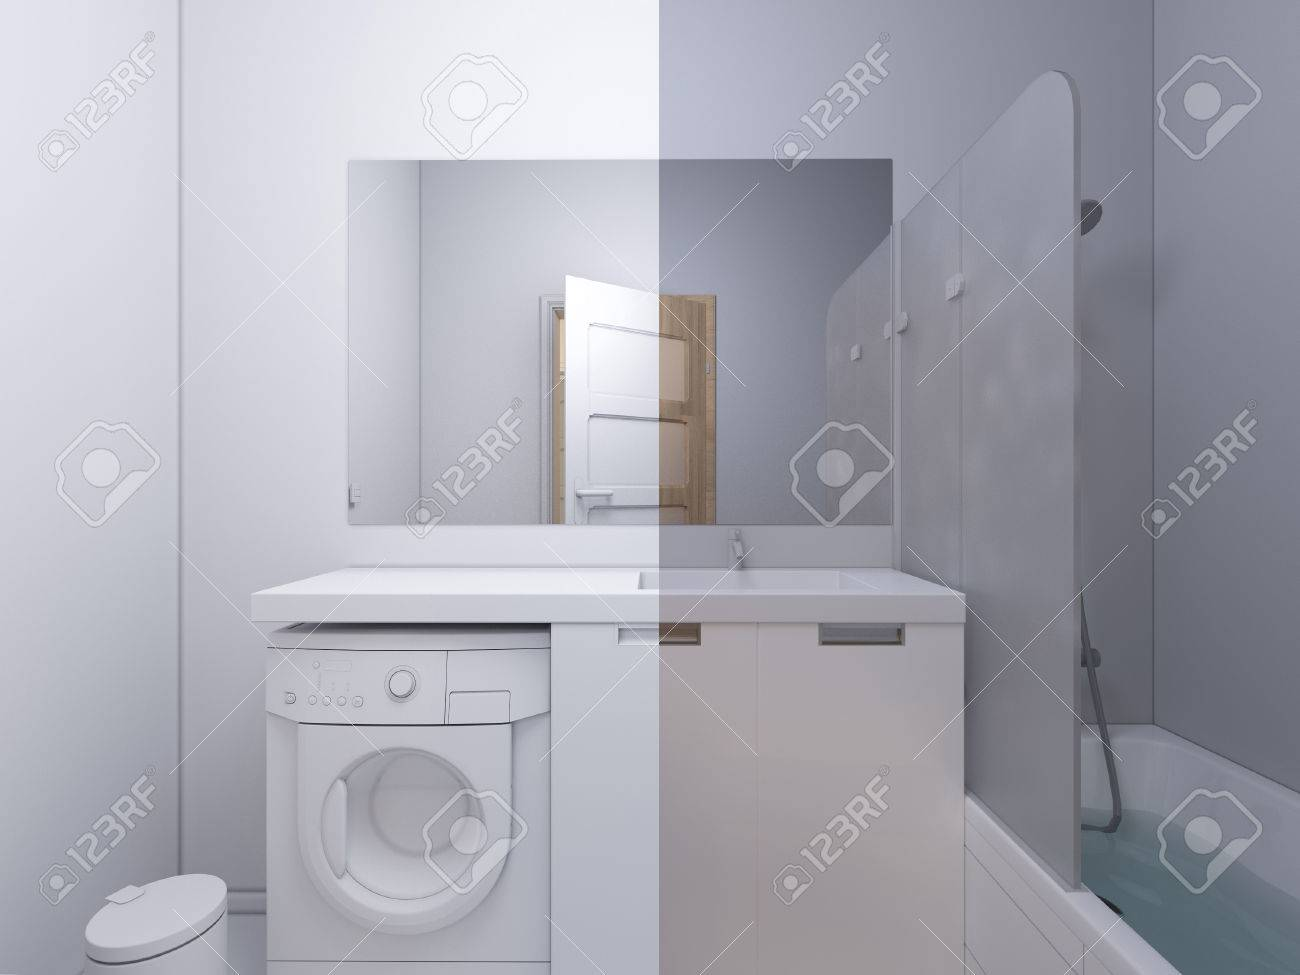 3d Render Collage Of Interior Design Bathroom. The Illustration ...